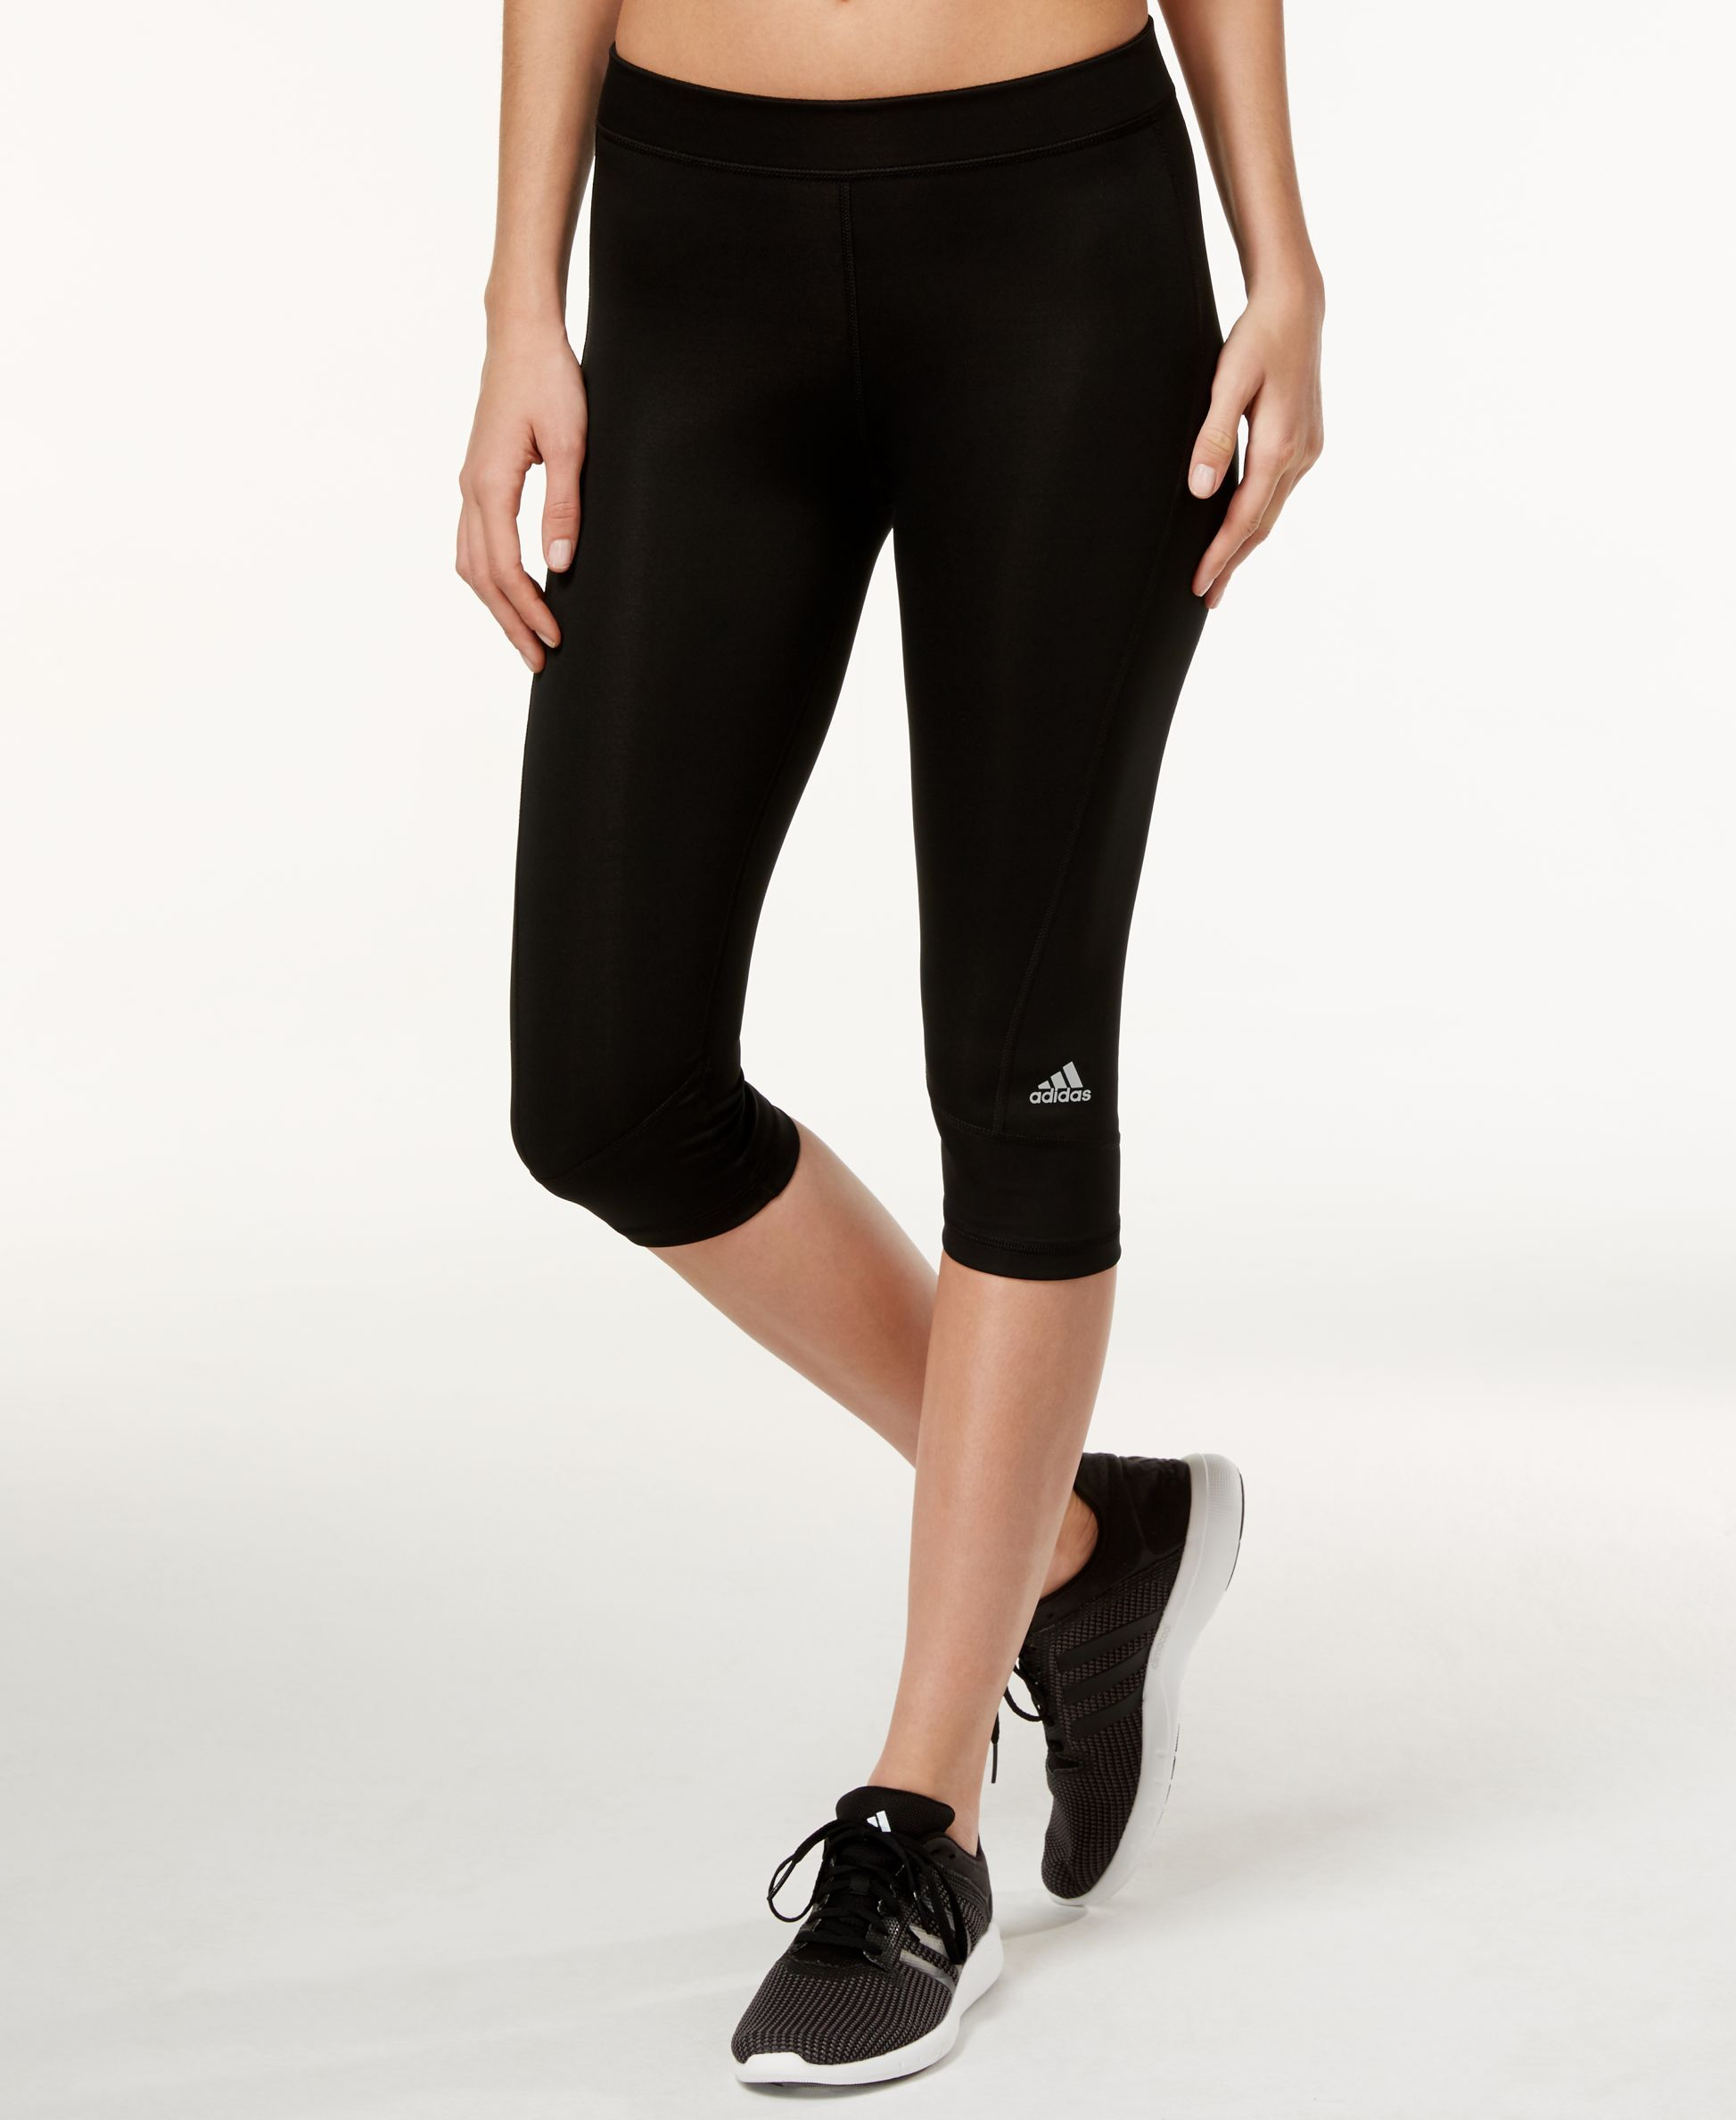 f03ec23e4d96 Adidas ClimaLite Capri Leggings